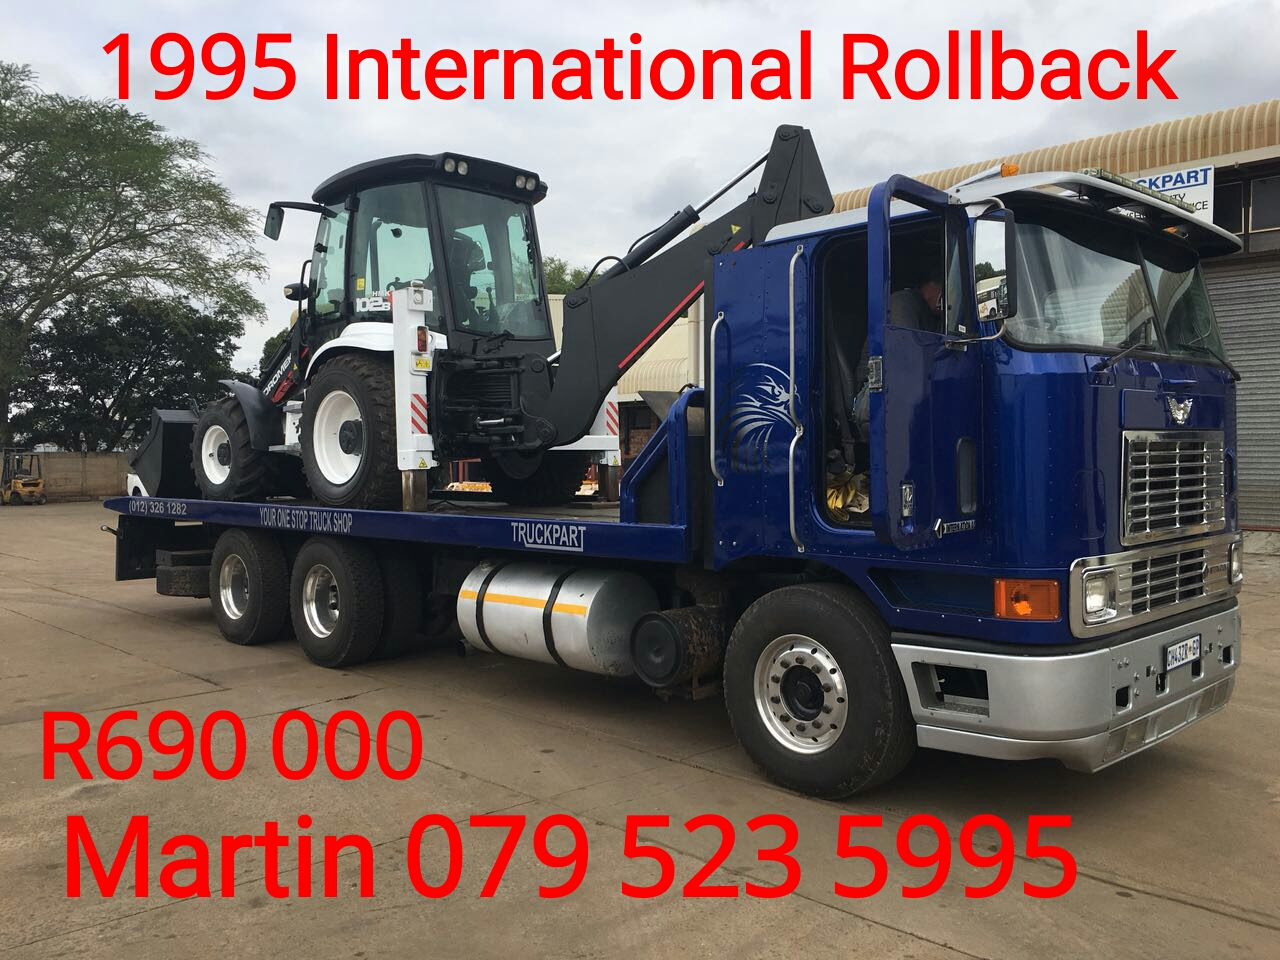 Rollback Truck